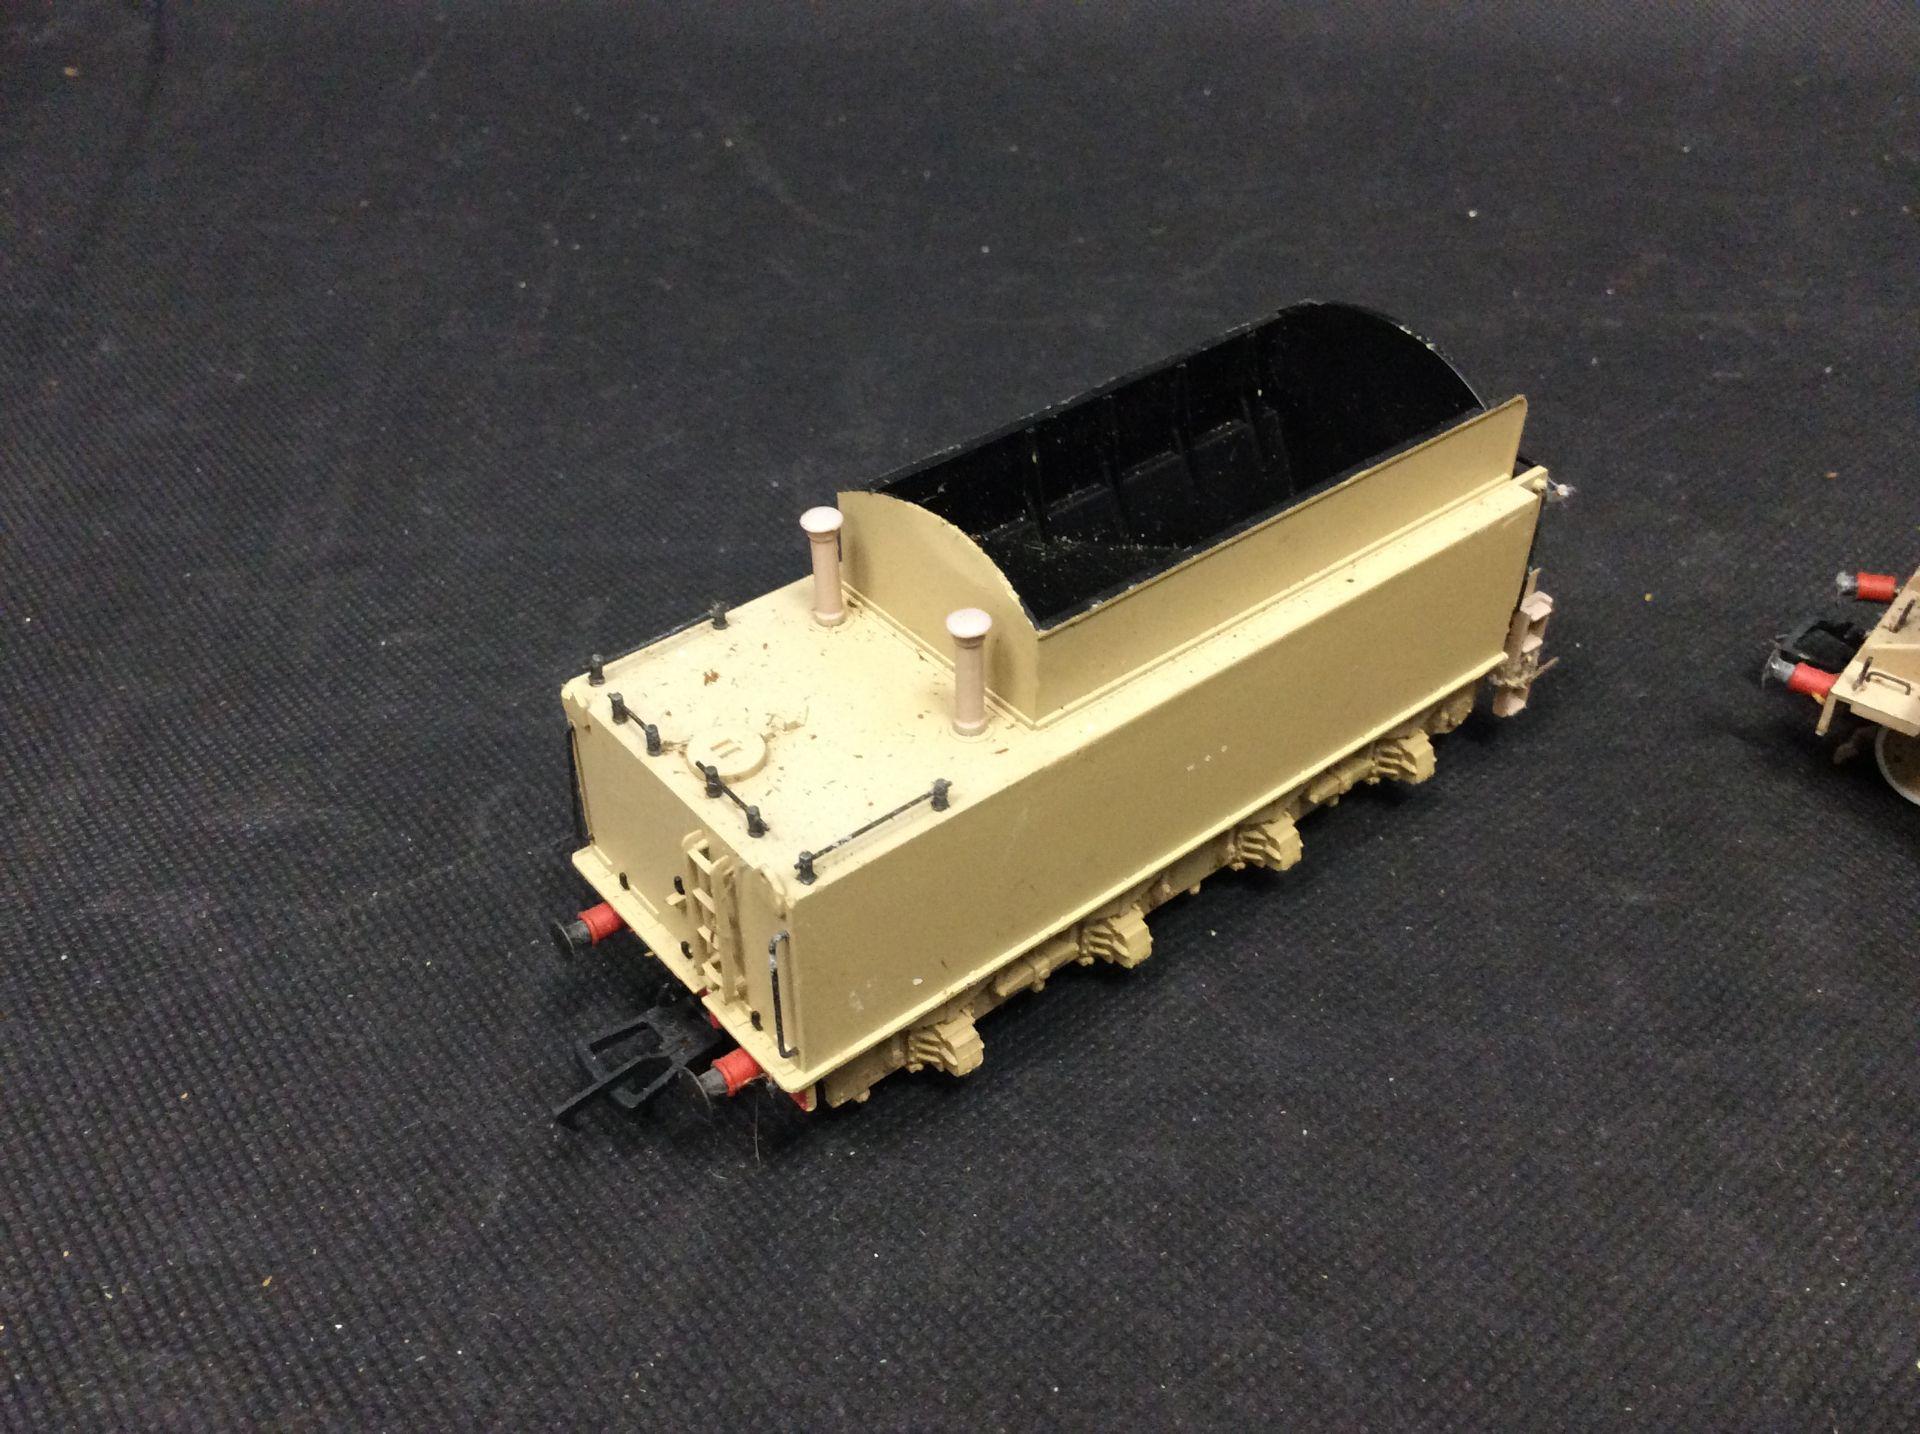 Rare bachmann 7199 loco - Image 3 of 3